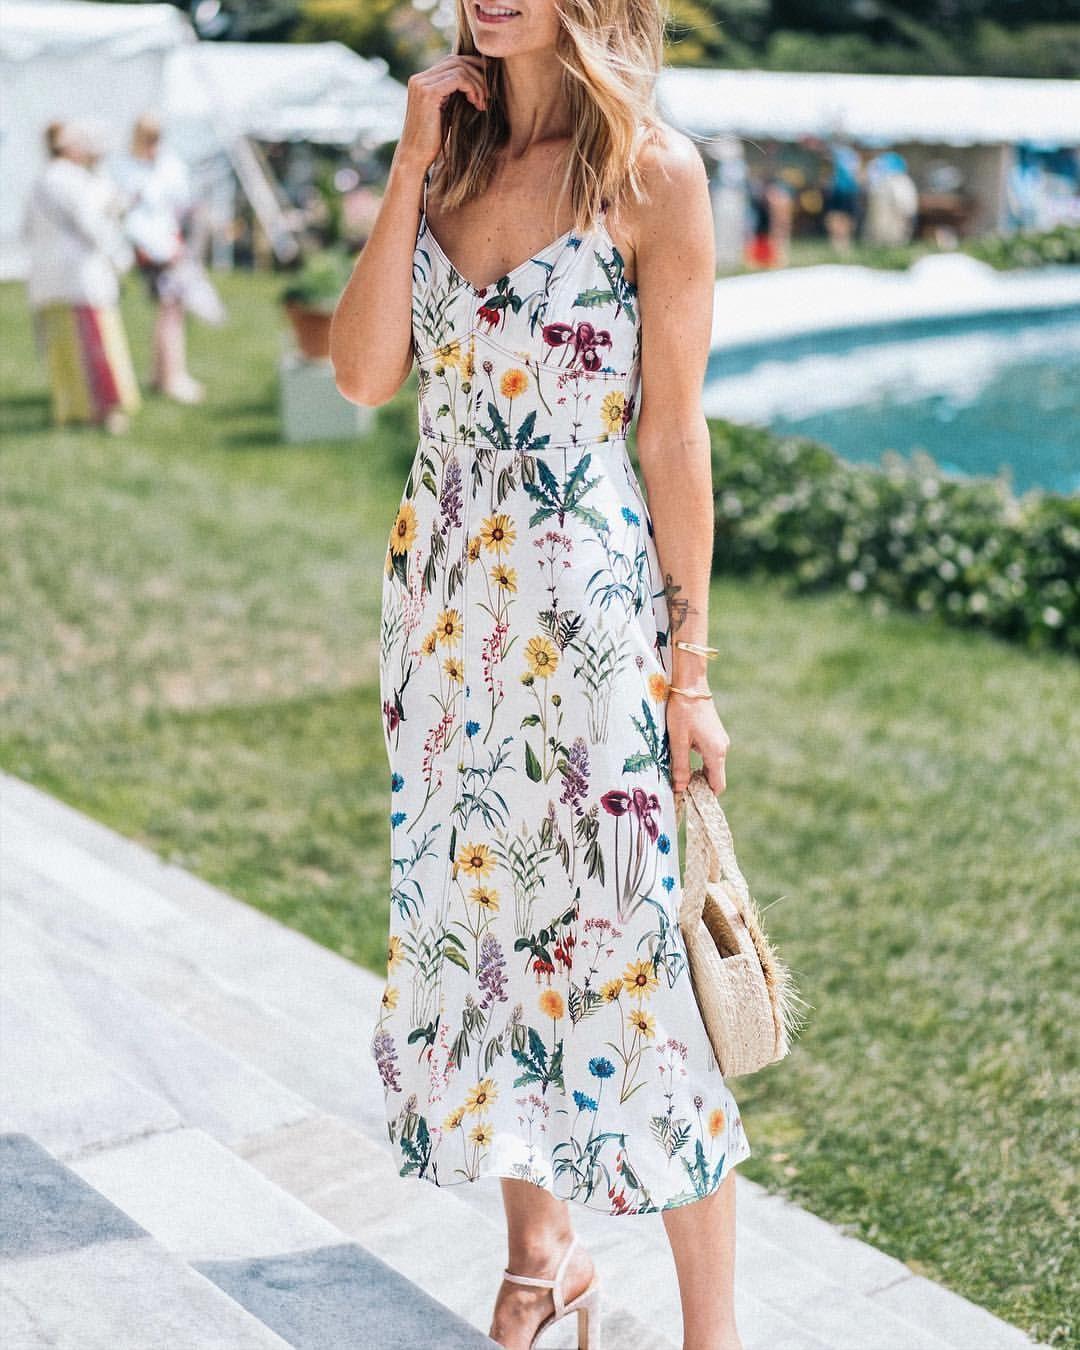 Beautiful Floral Maxi Dress For Summer Wedding Guest Dress Fashion Summer Wedding Outfits Dresses [ 1350 x 1080 Pixel ]